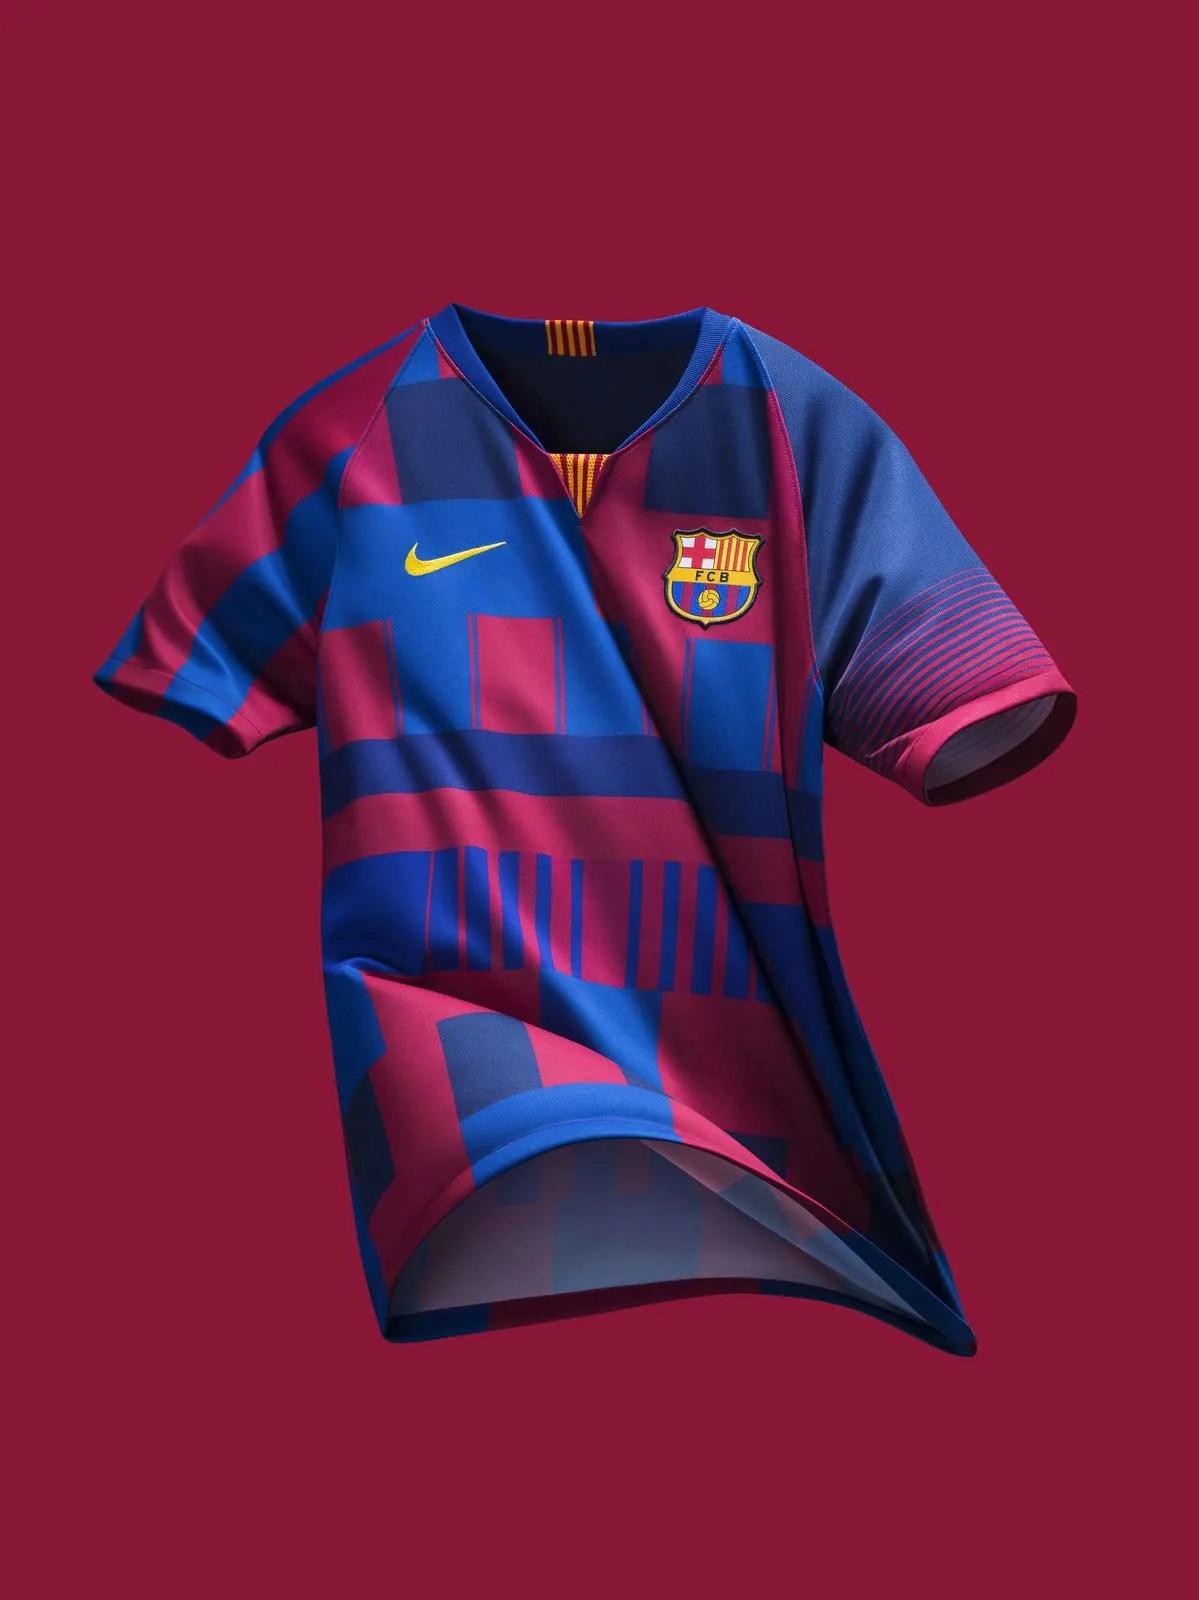 Maillot Anniversaire Nike x Barça